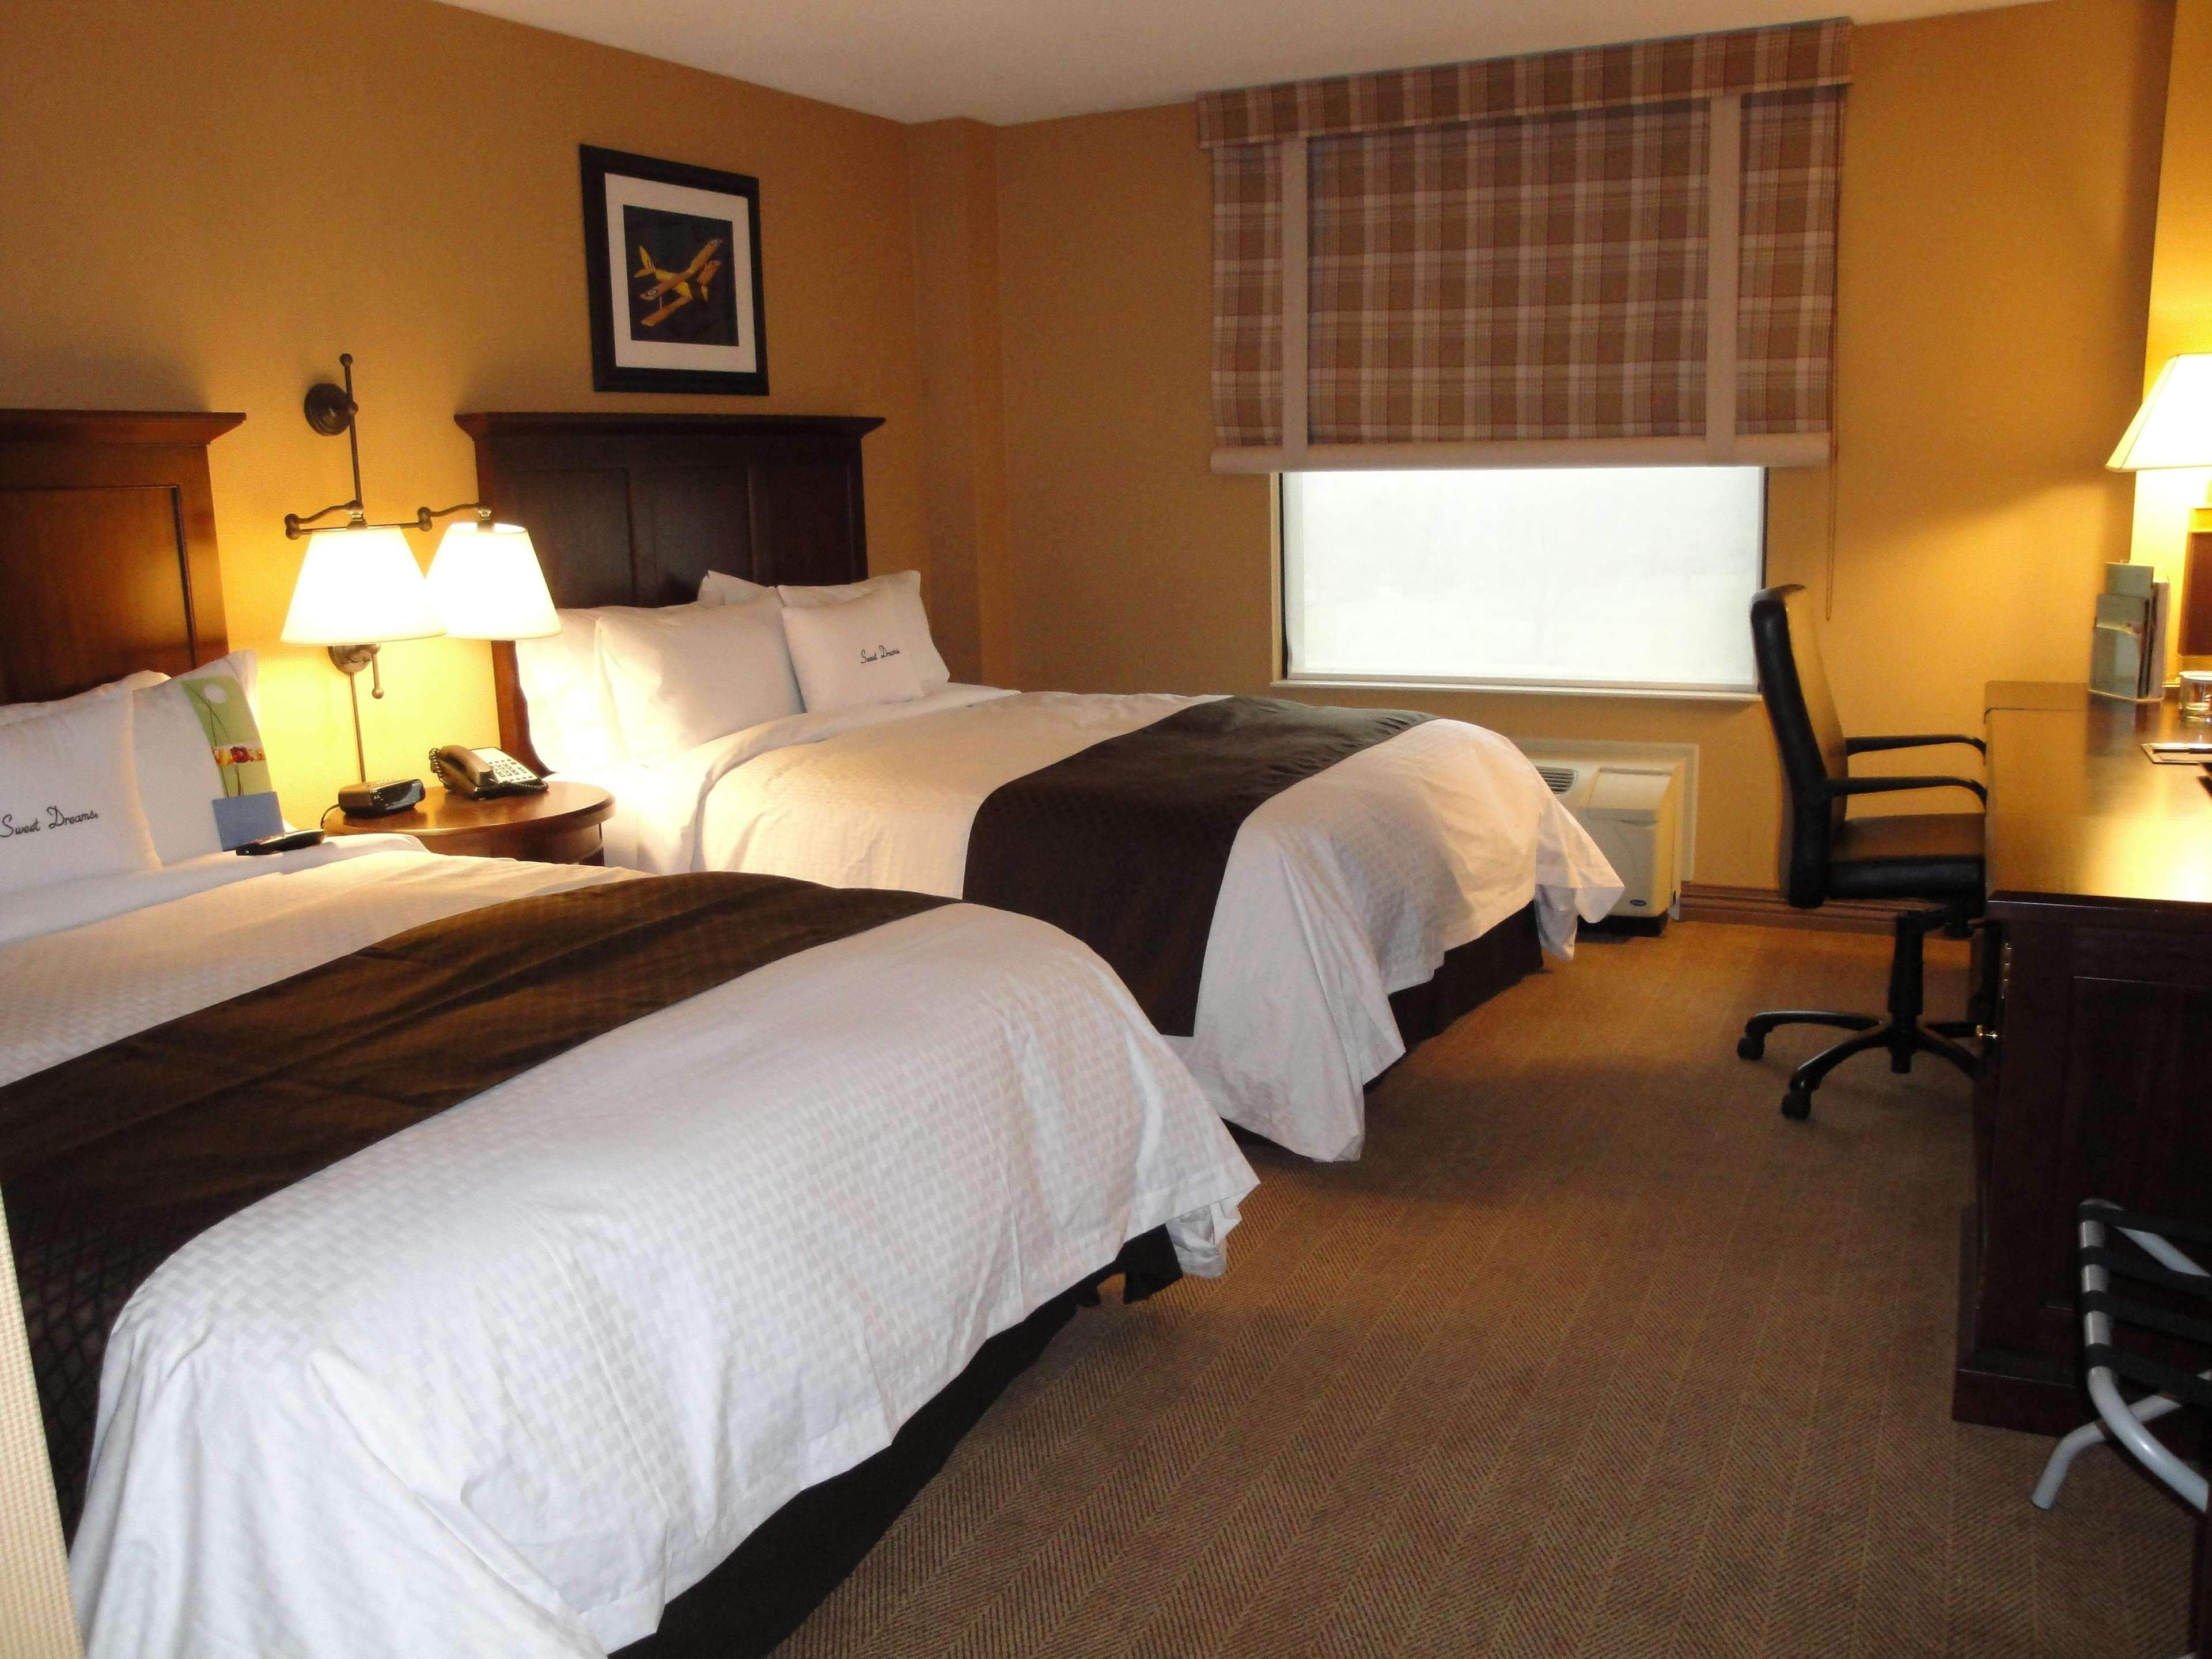 DoubleTree by Hilton Hotel Cincinnati Airport image 2